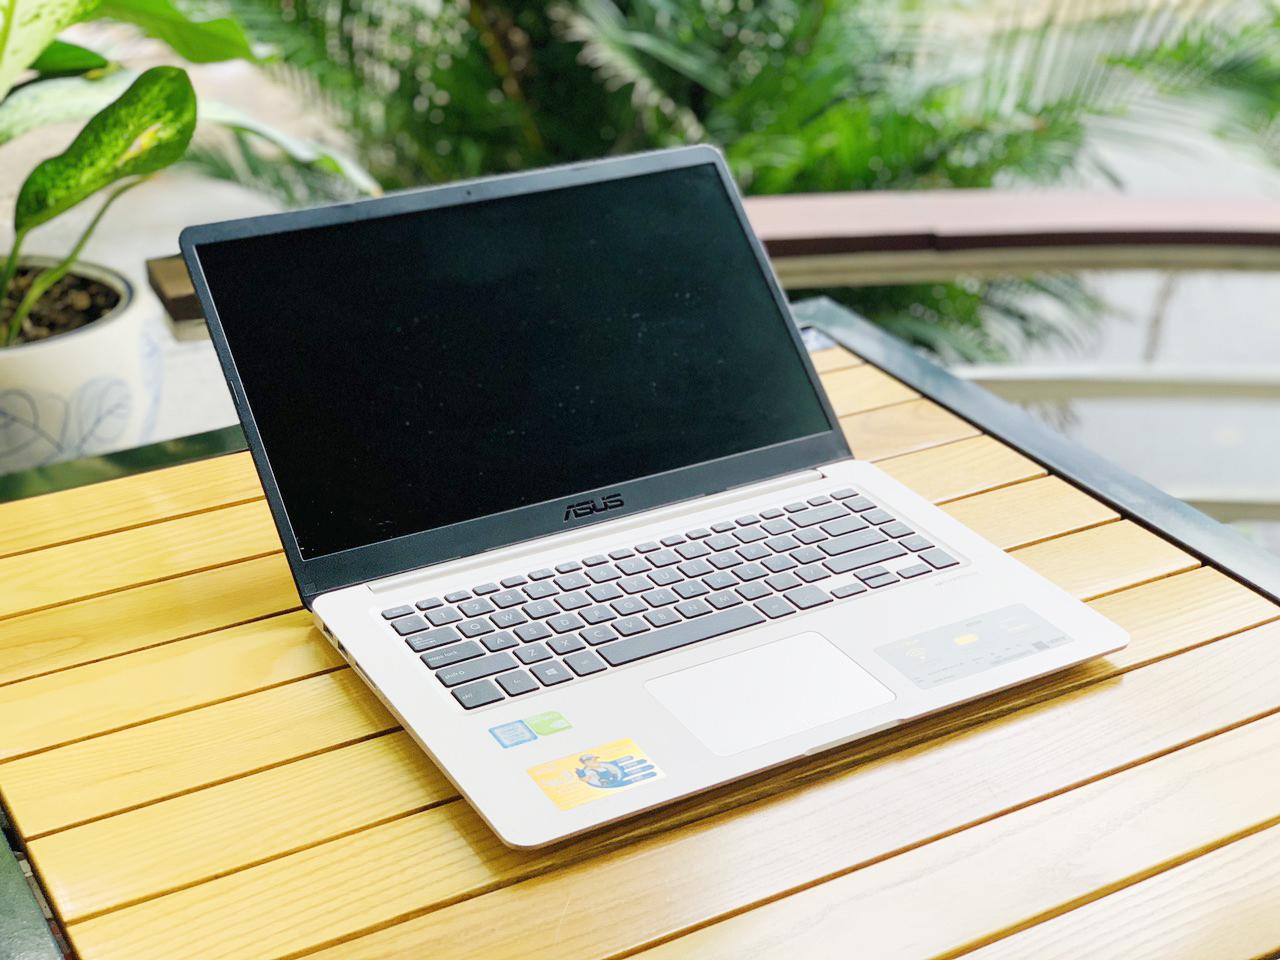 Asus Vivobook S510